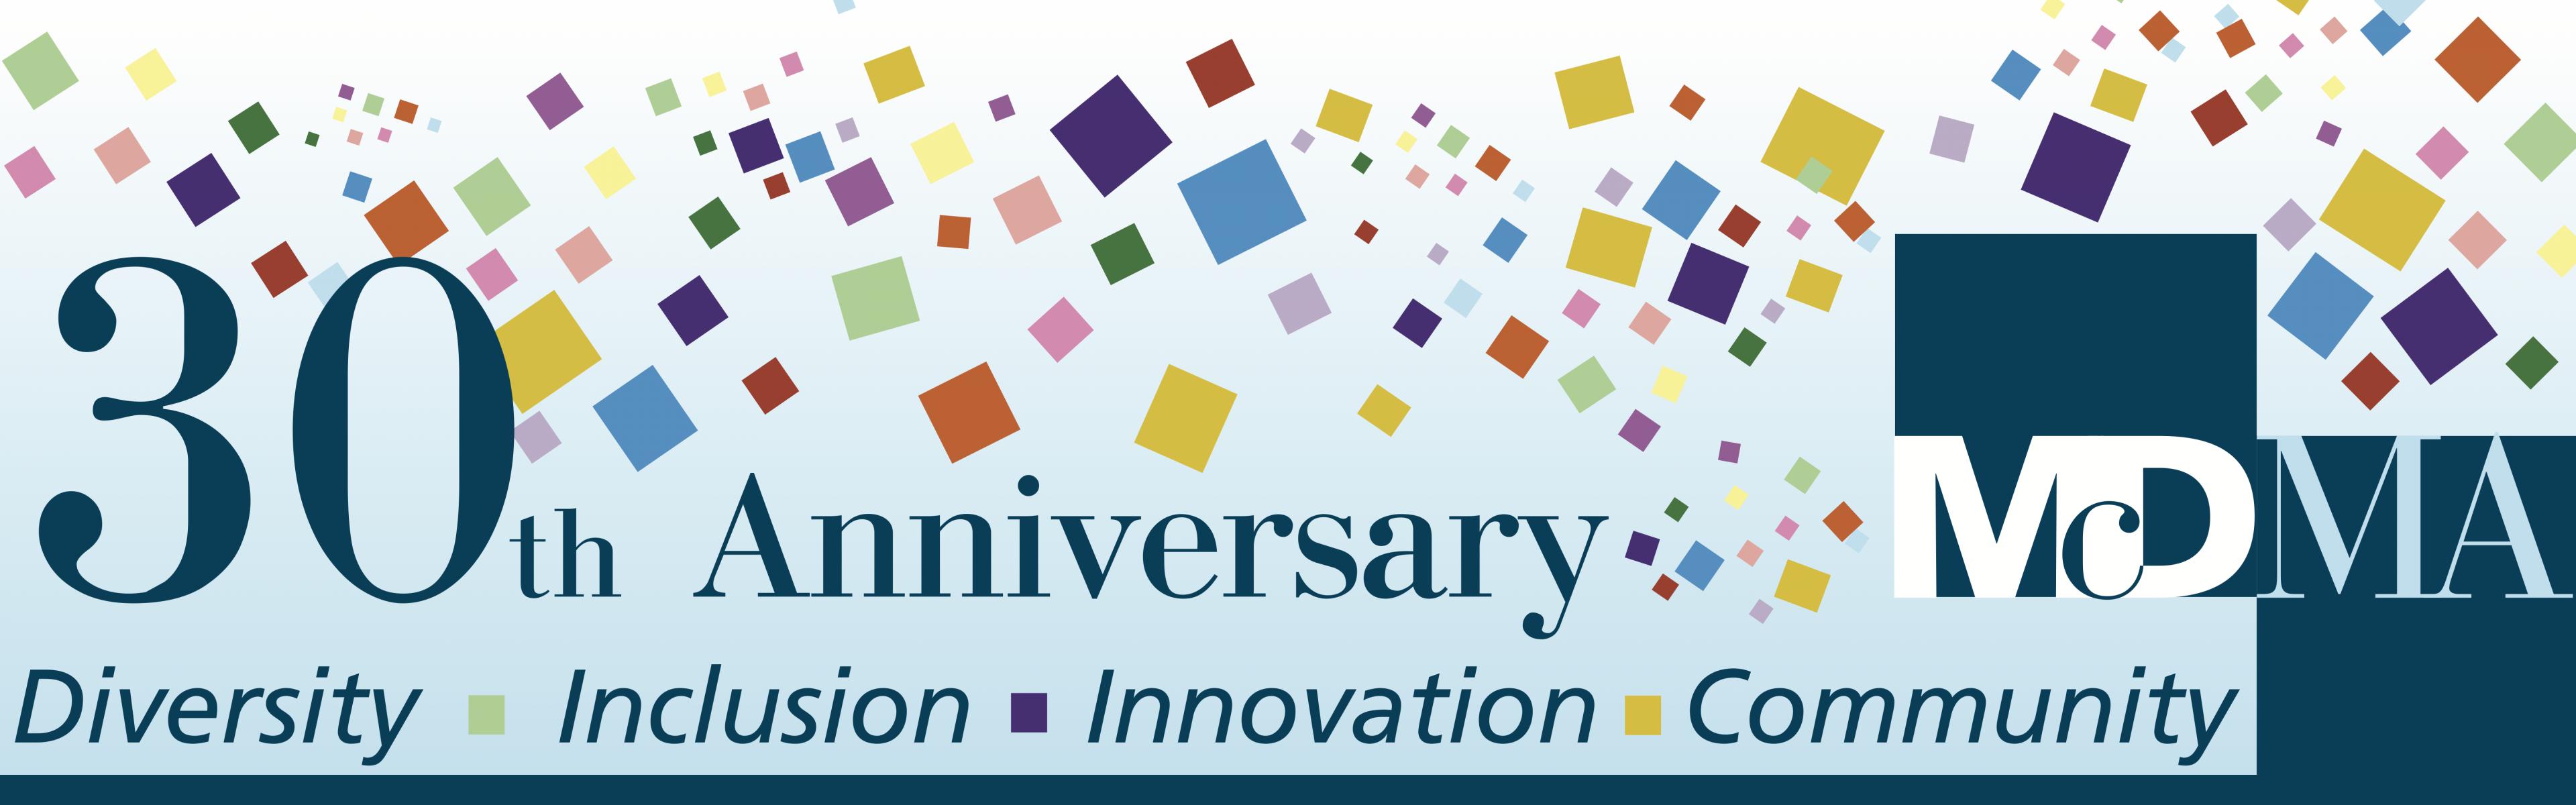 "Banner reads: ""30th Anniversary McDMA: Diversity, Inclusion, Innovation, Community"""